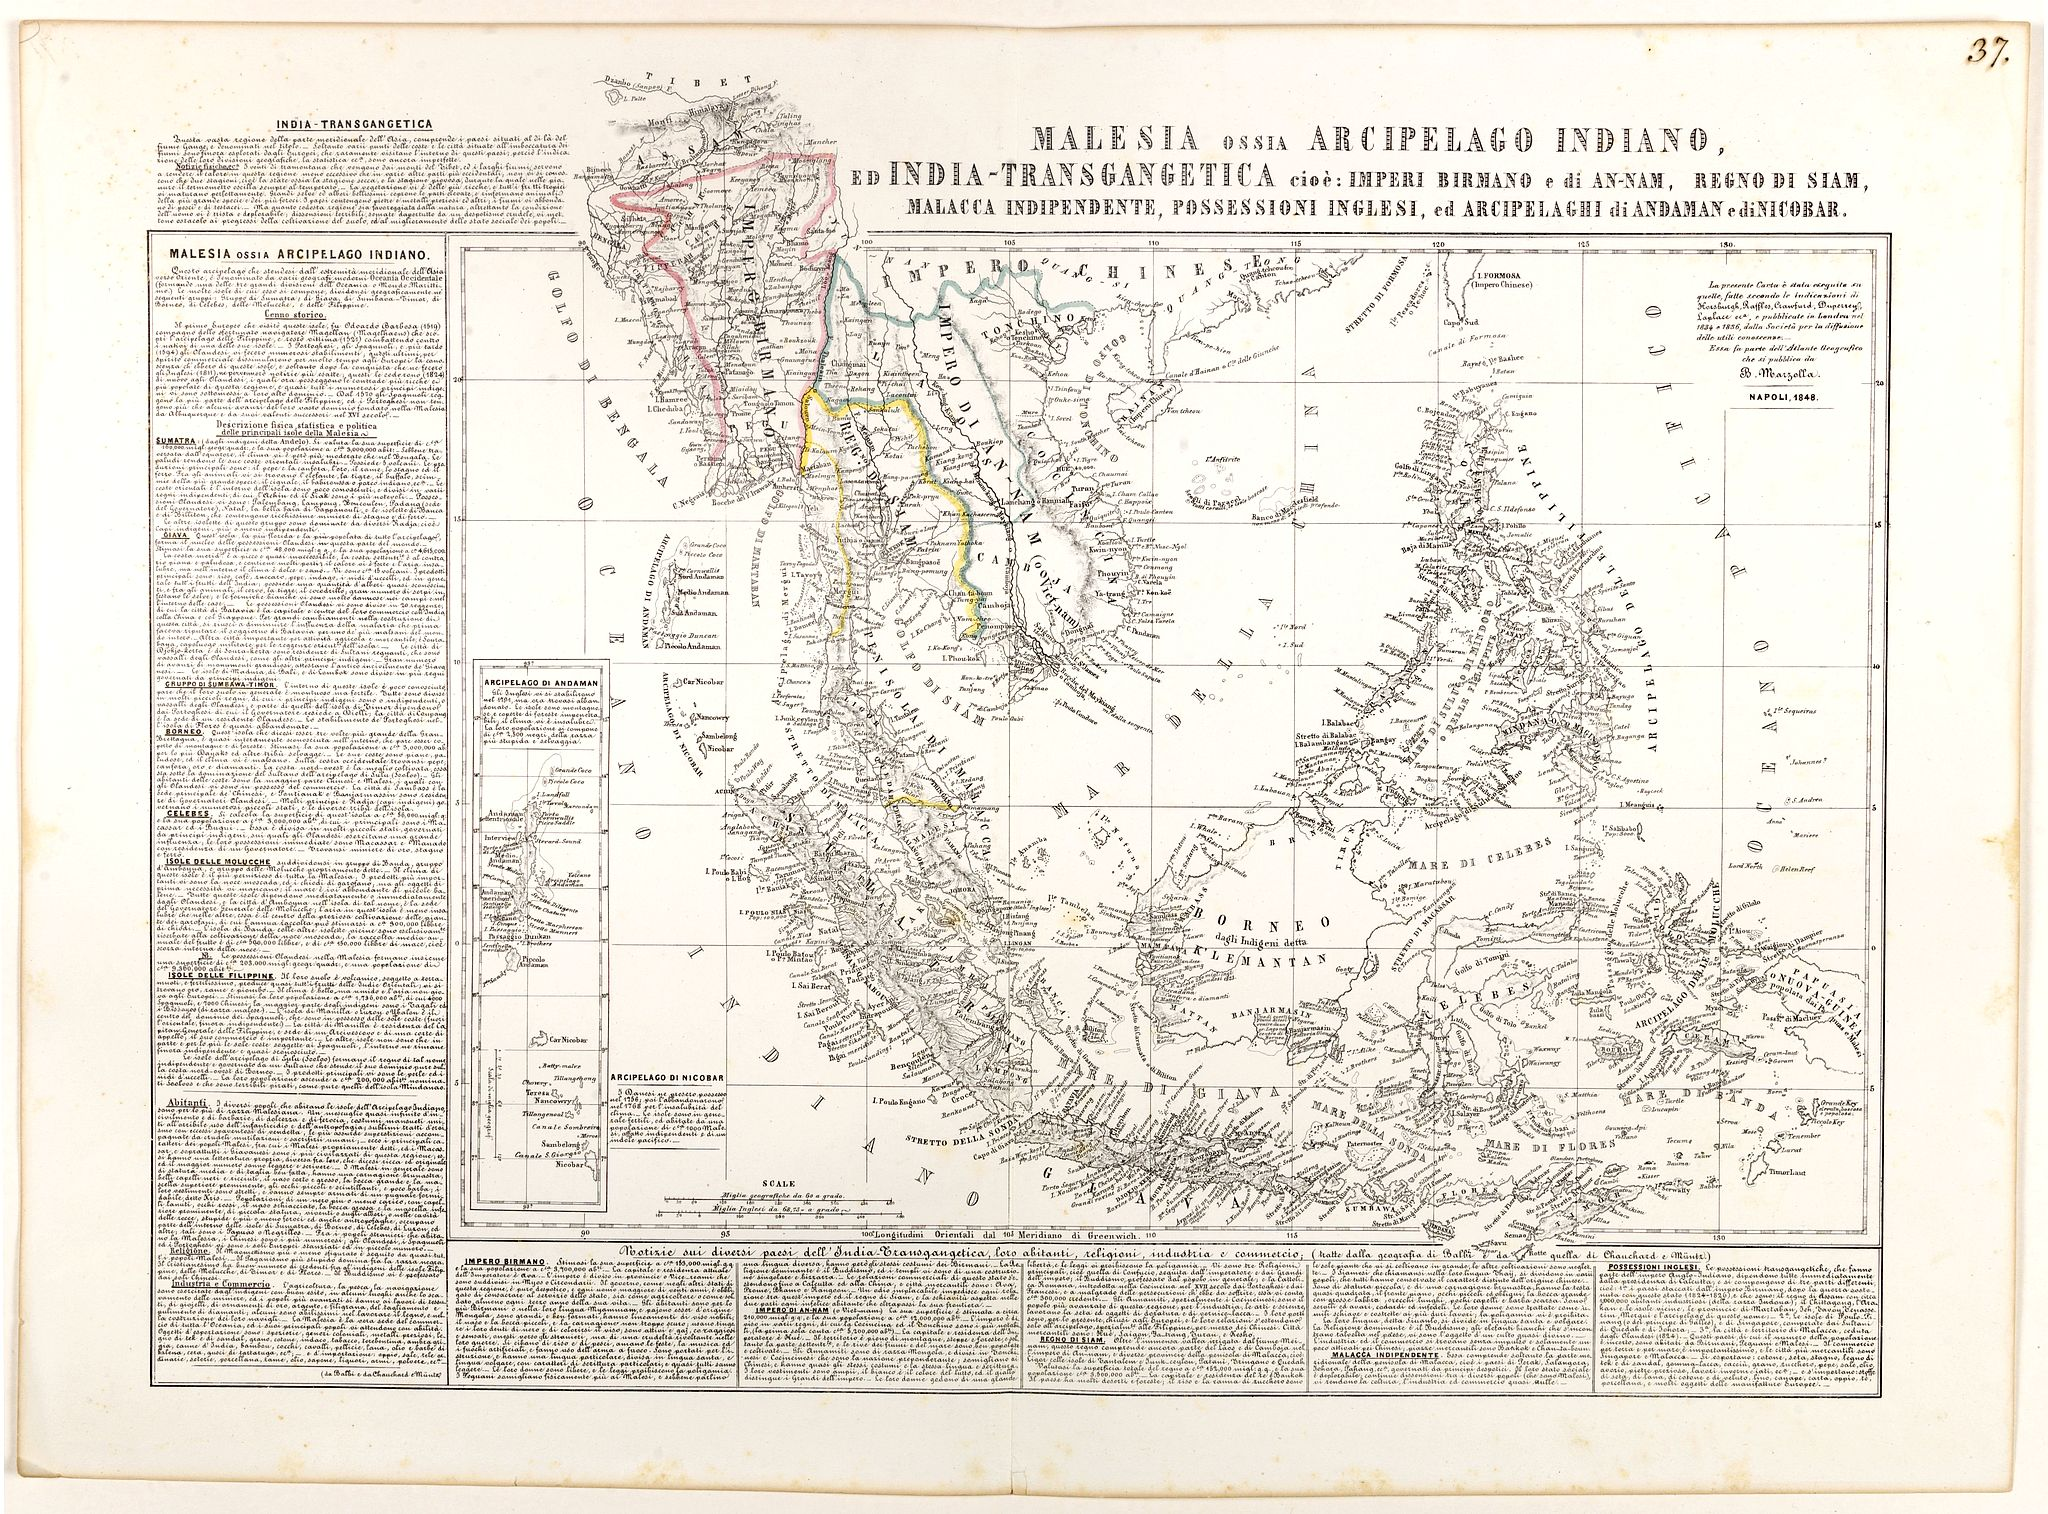 MARZOLLA, B. -  Malesia ossia Arcipelago Indiano, ed India-Transgangetica.